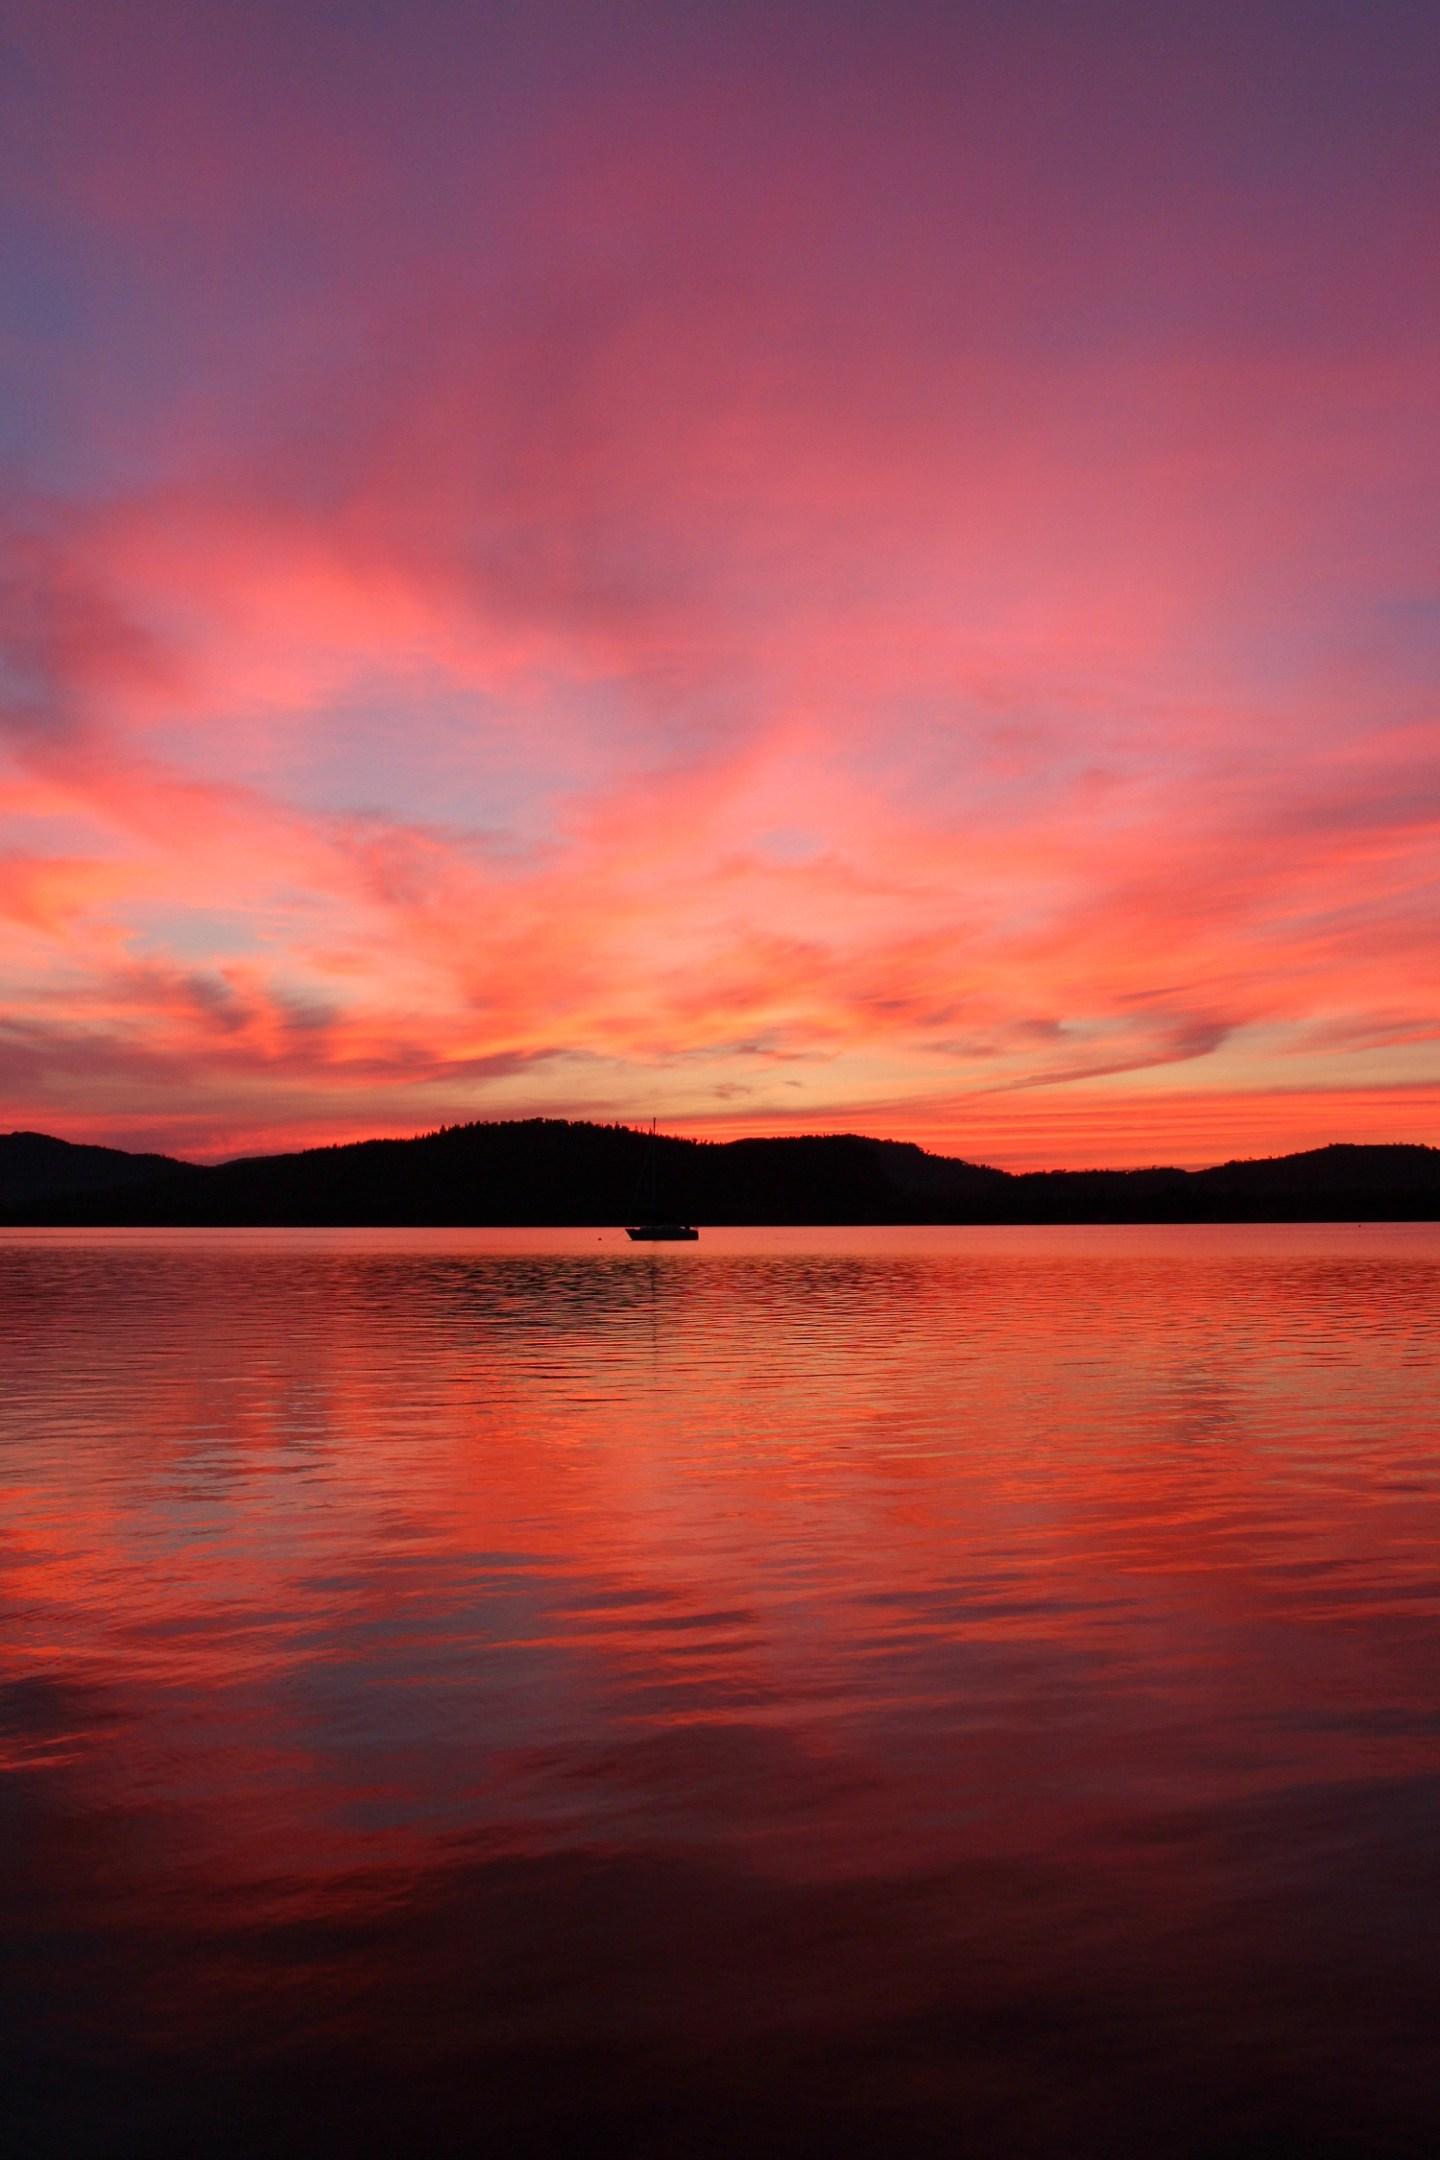 Sunset Sailboat Photo